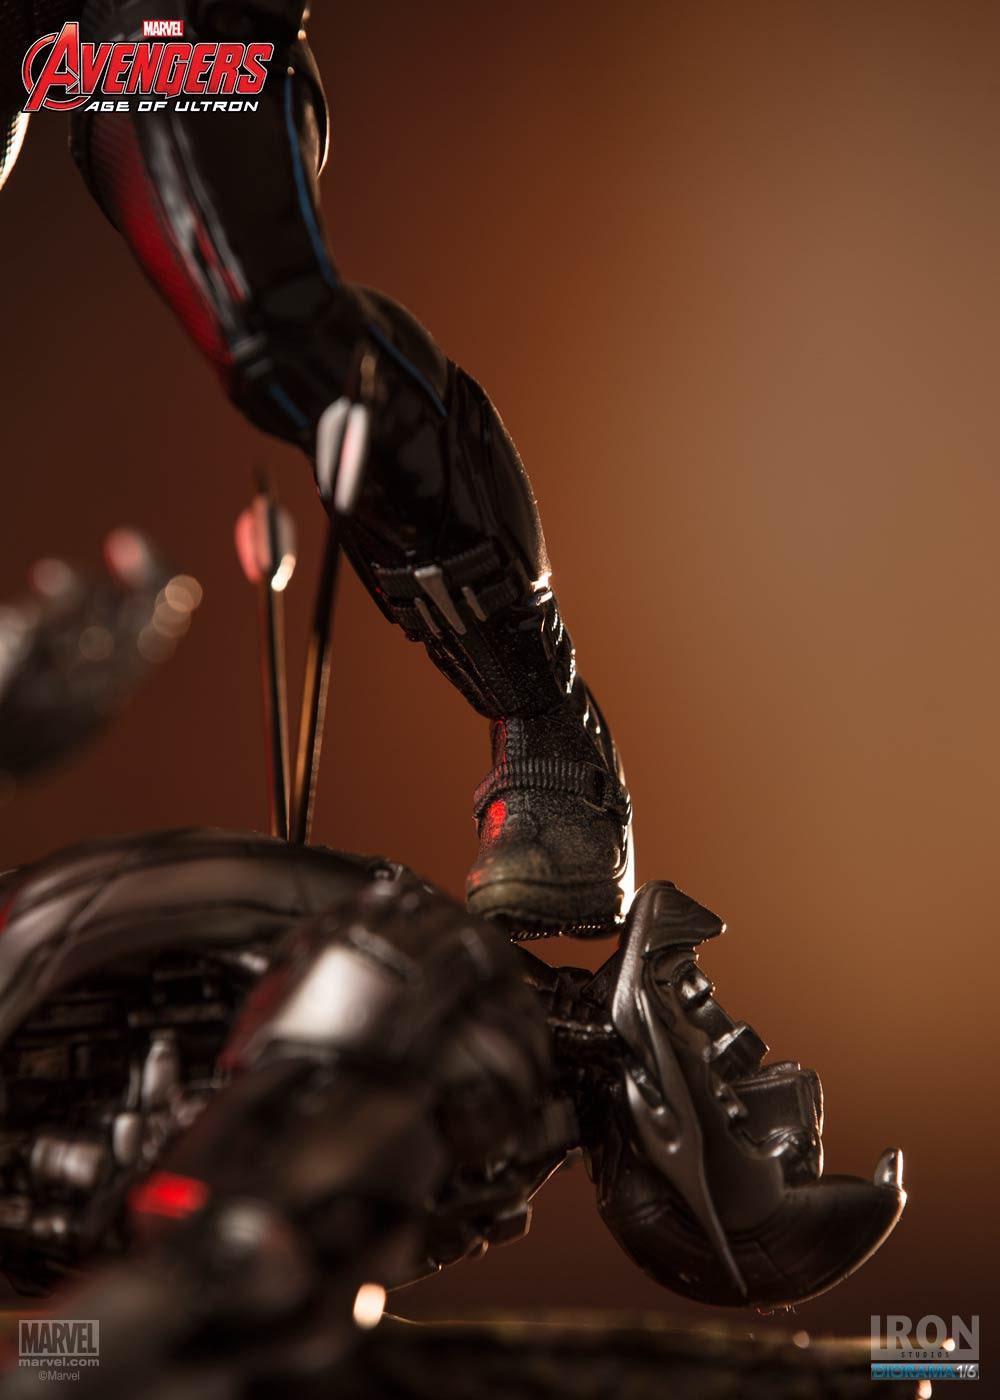 Black Widow Takes on Ultron in New Iron Studios Statue